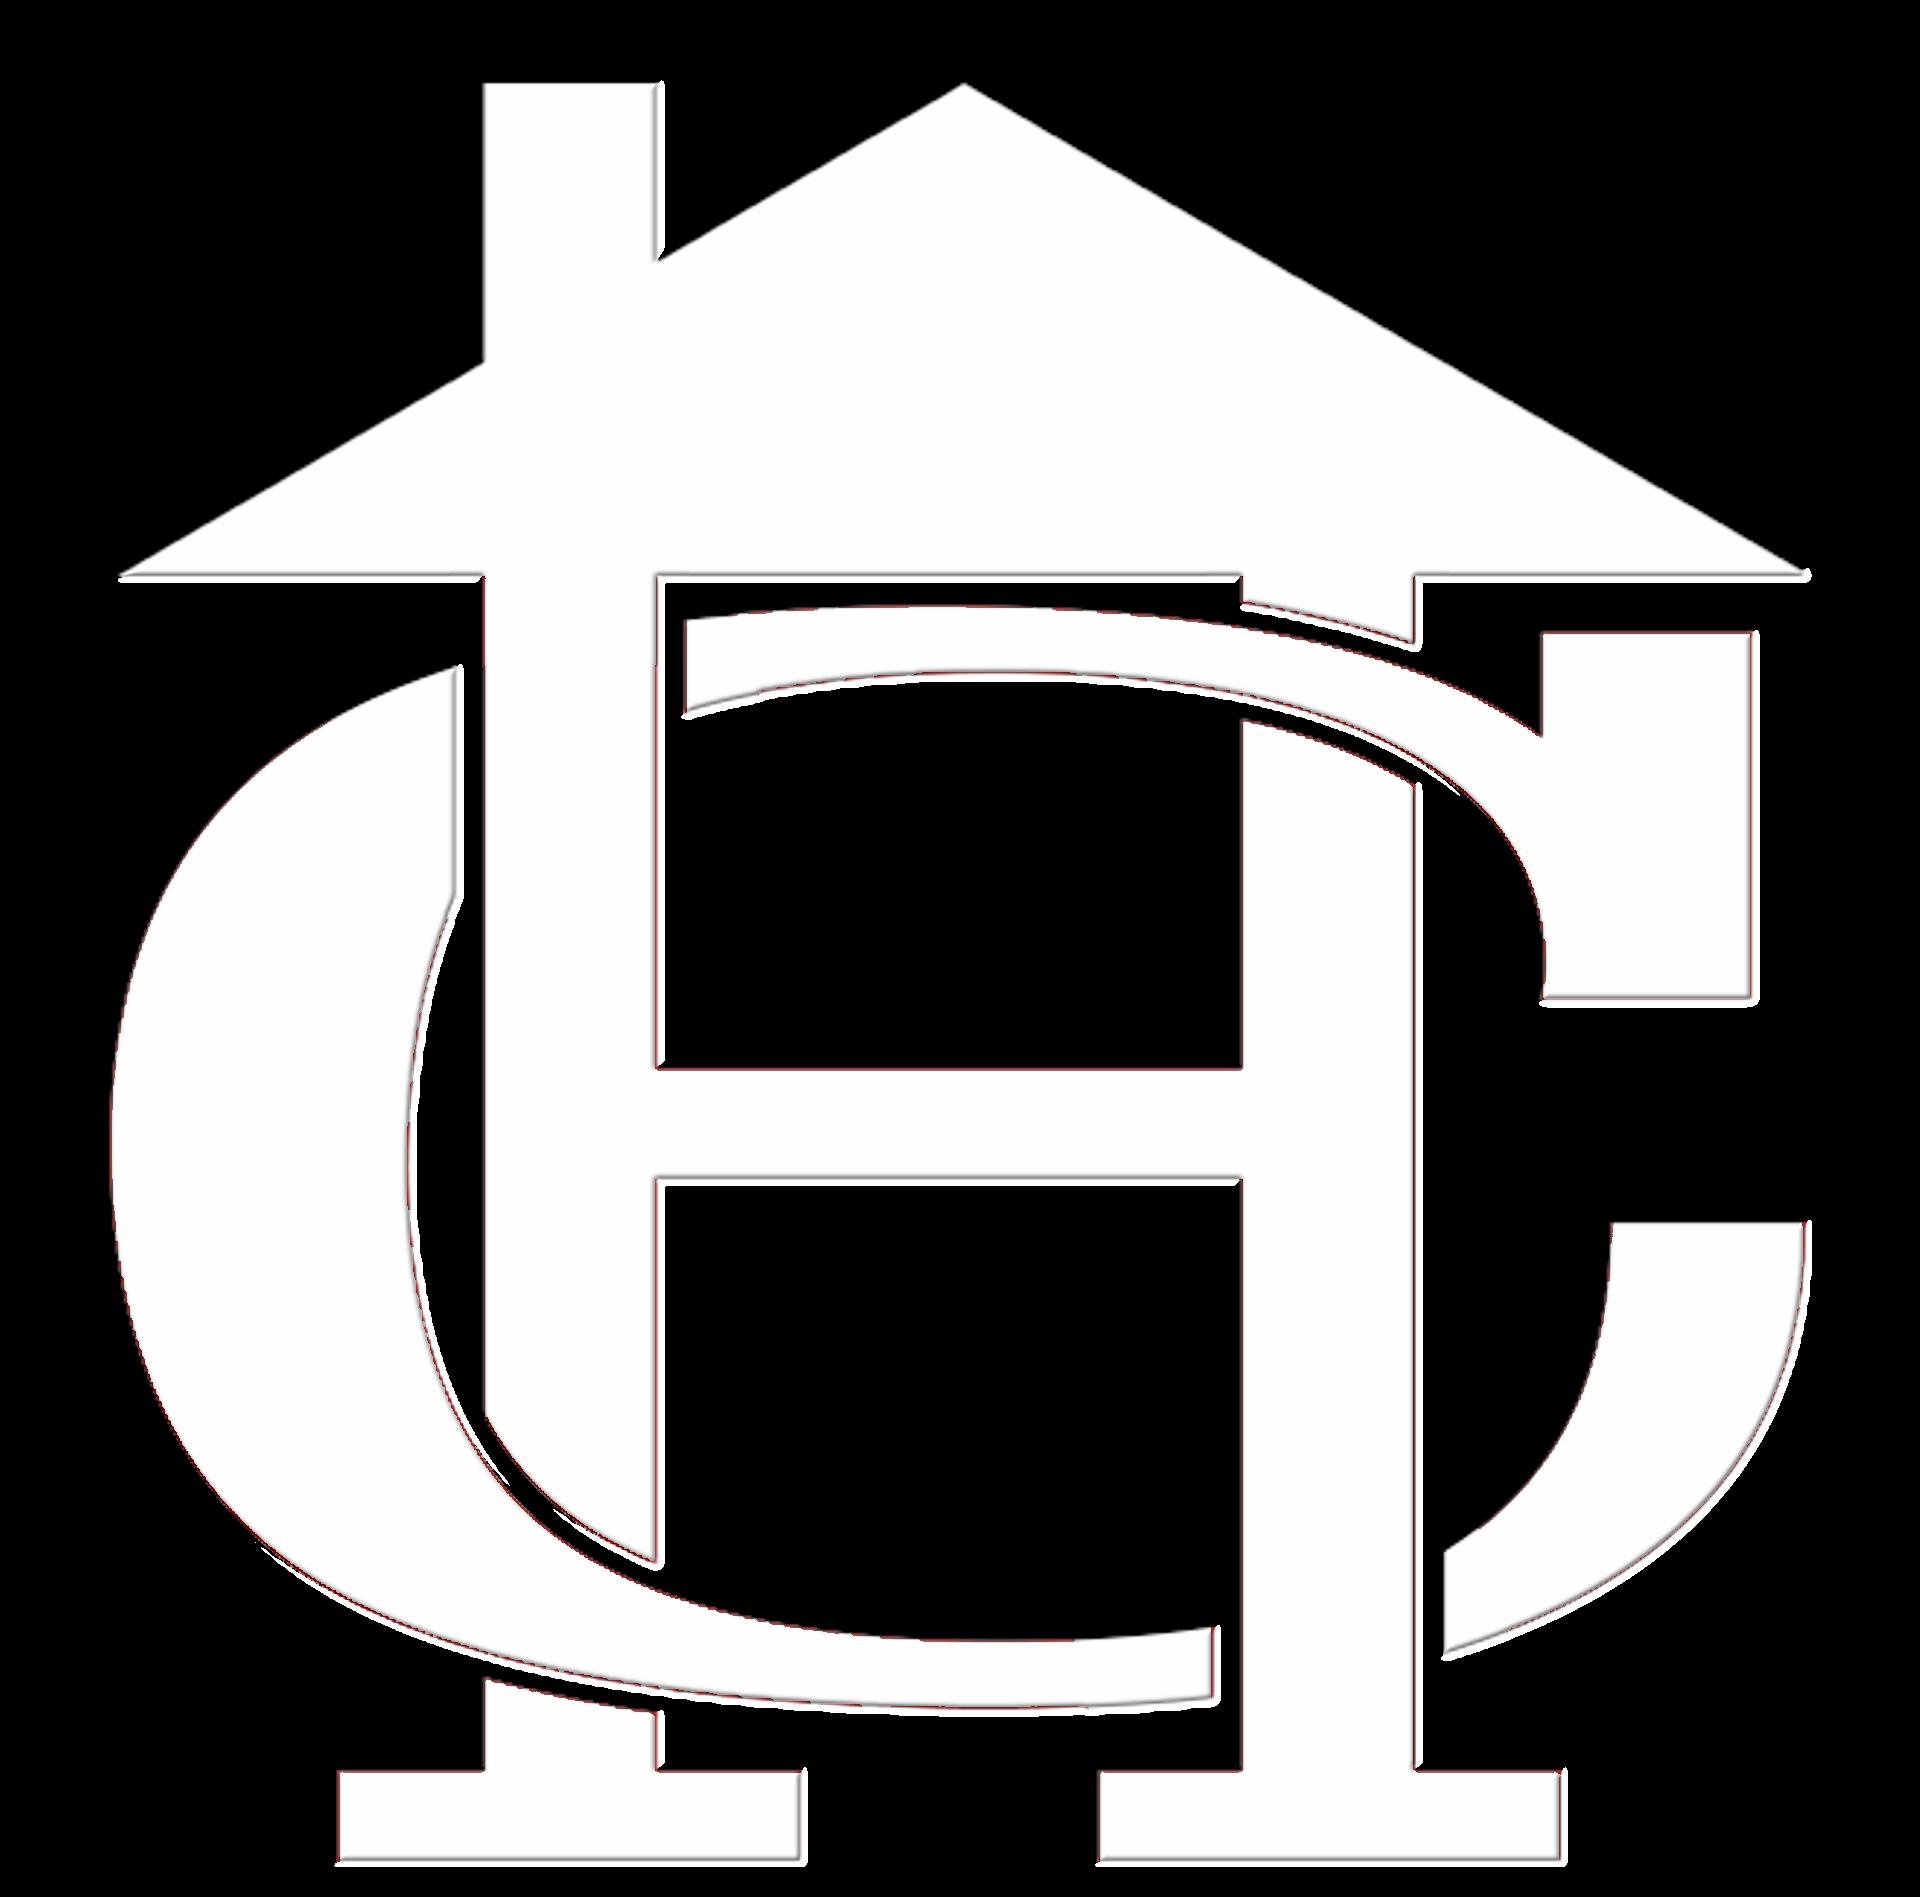 Honesty clipart trustworthiness. Hudgins contractors llc trustworthy